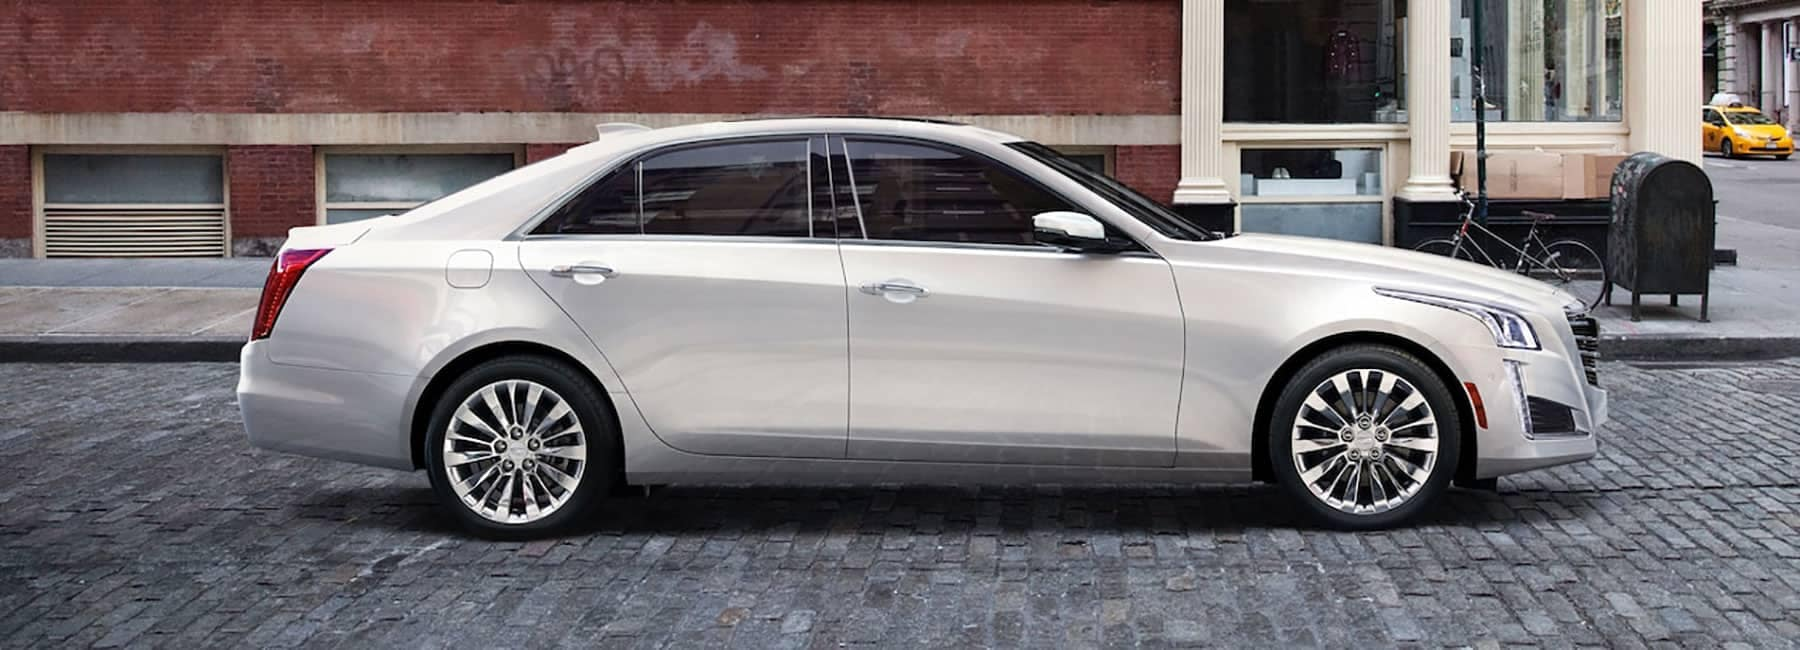 Cadillac-CTS-Sedan parked on bricked street